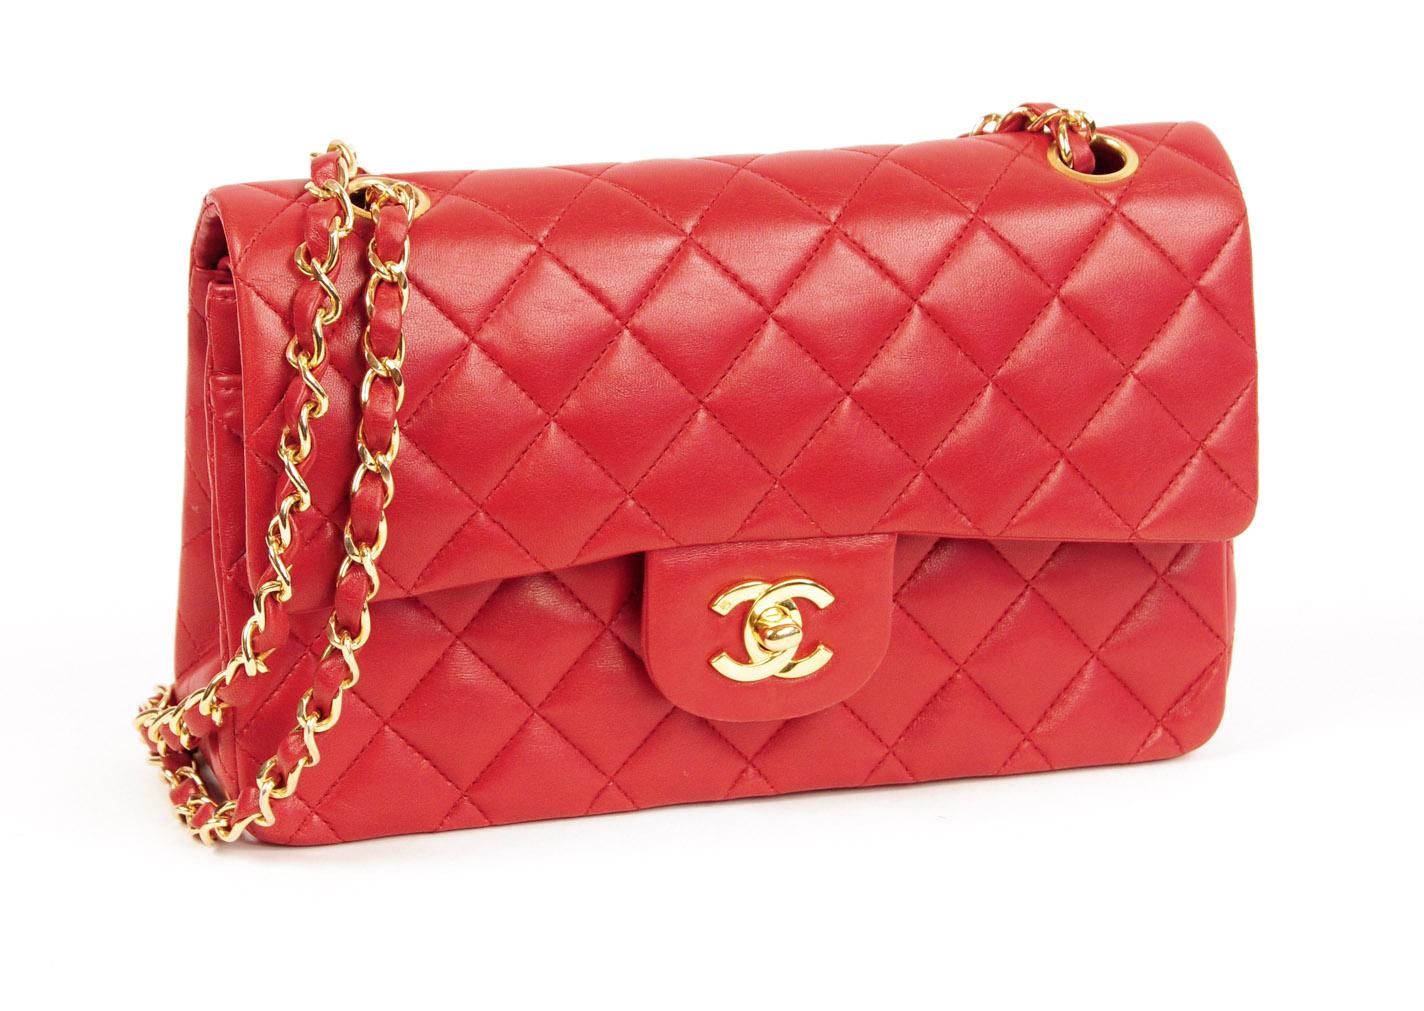 Красная сумка chanel / шанель, цена - 350 грн